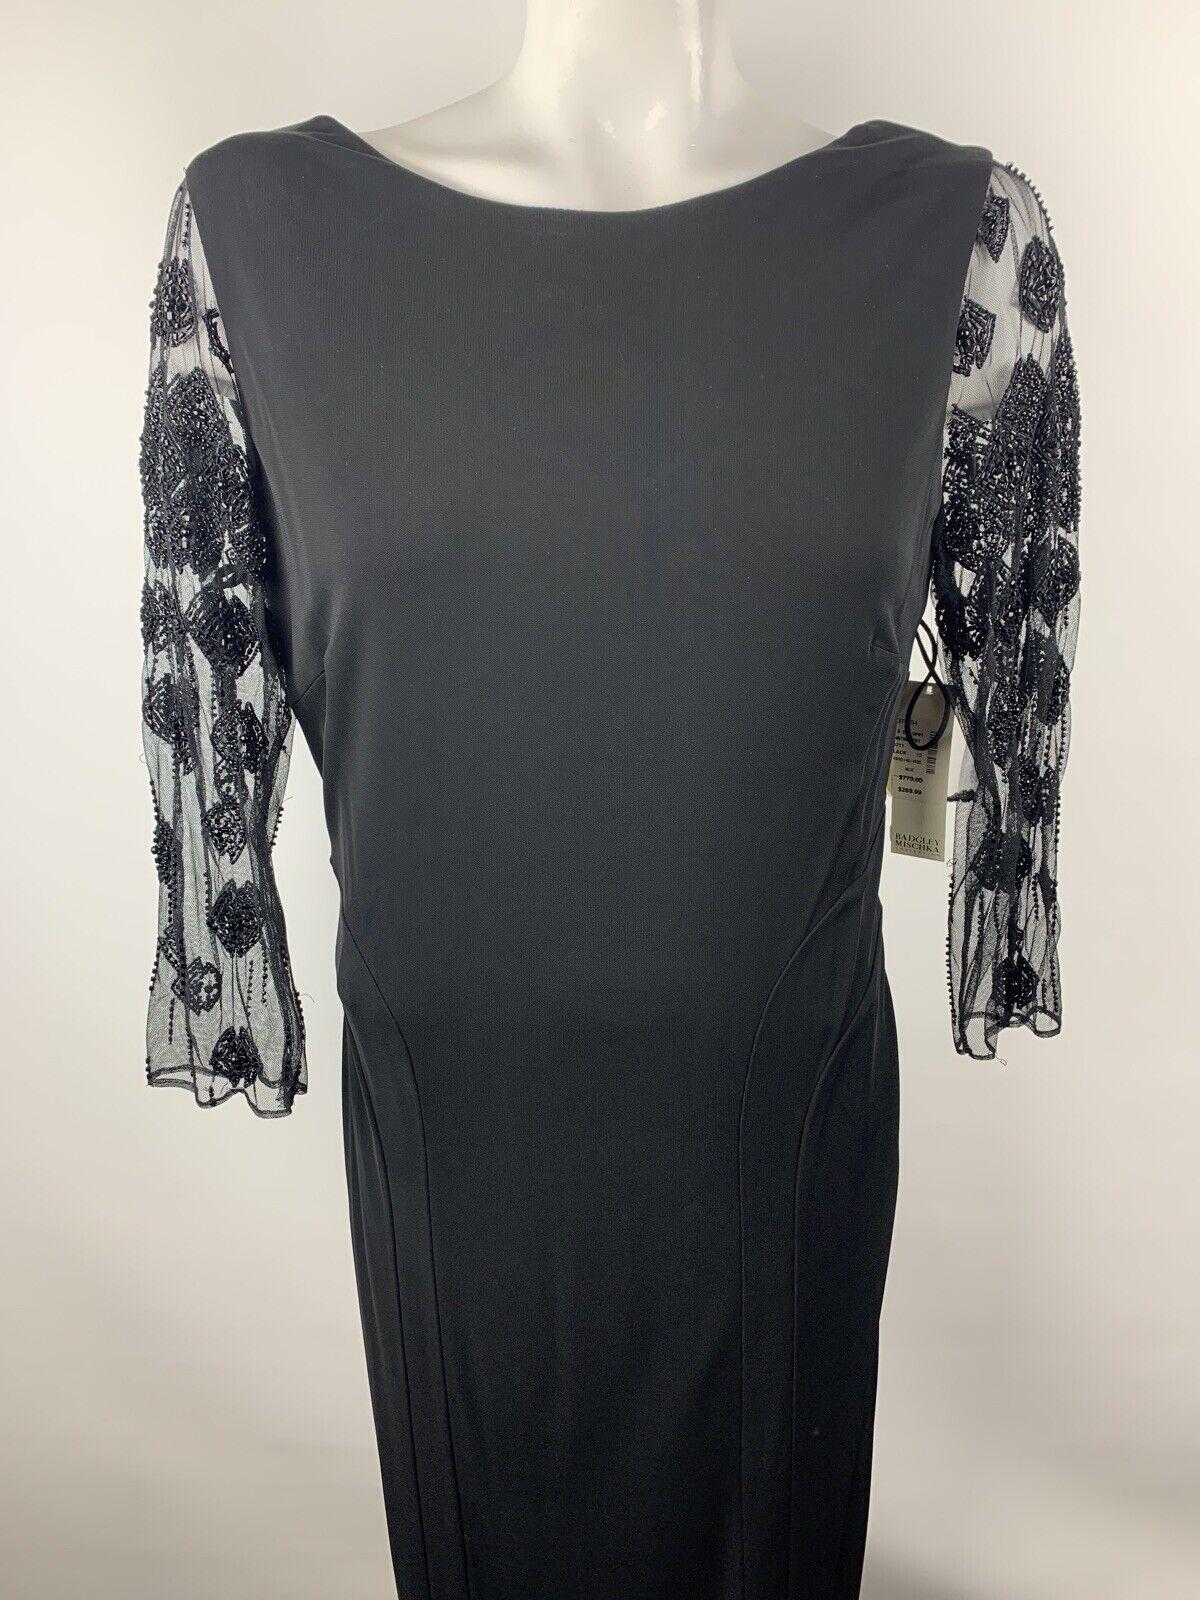 Badgley Mischka Womens Sz 12 Black Long Sleeve Beaded Cocktail Party Dress